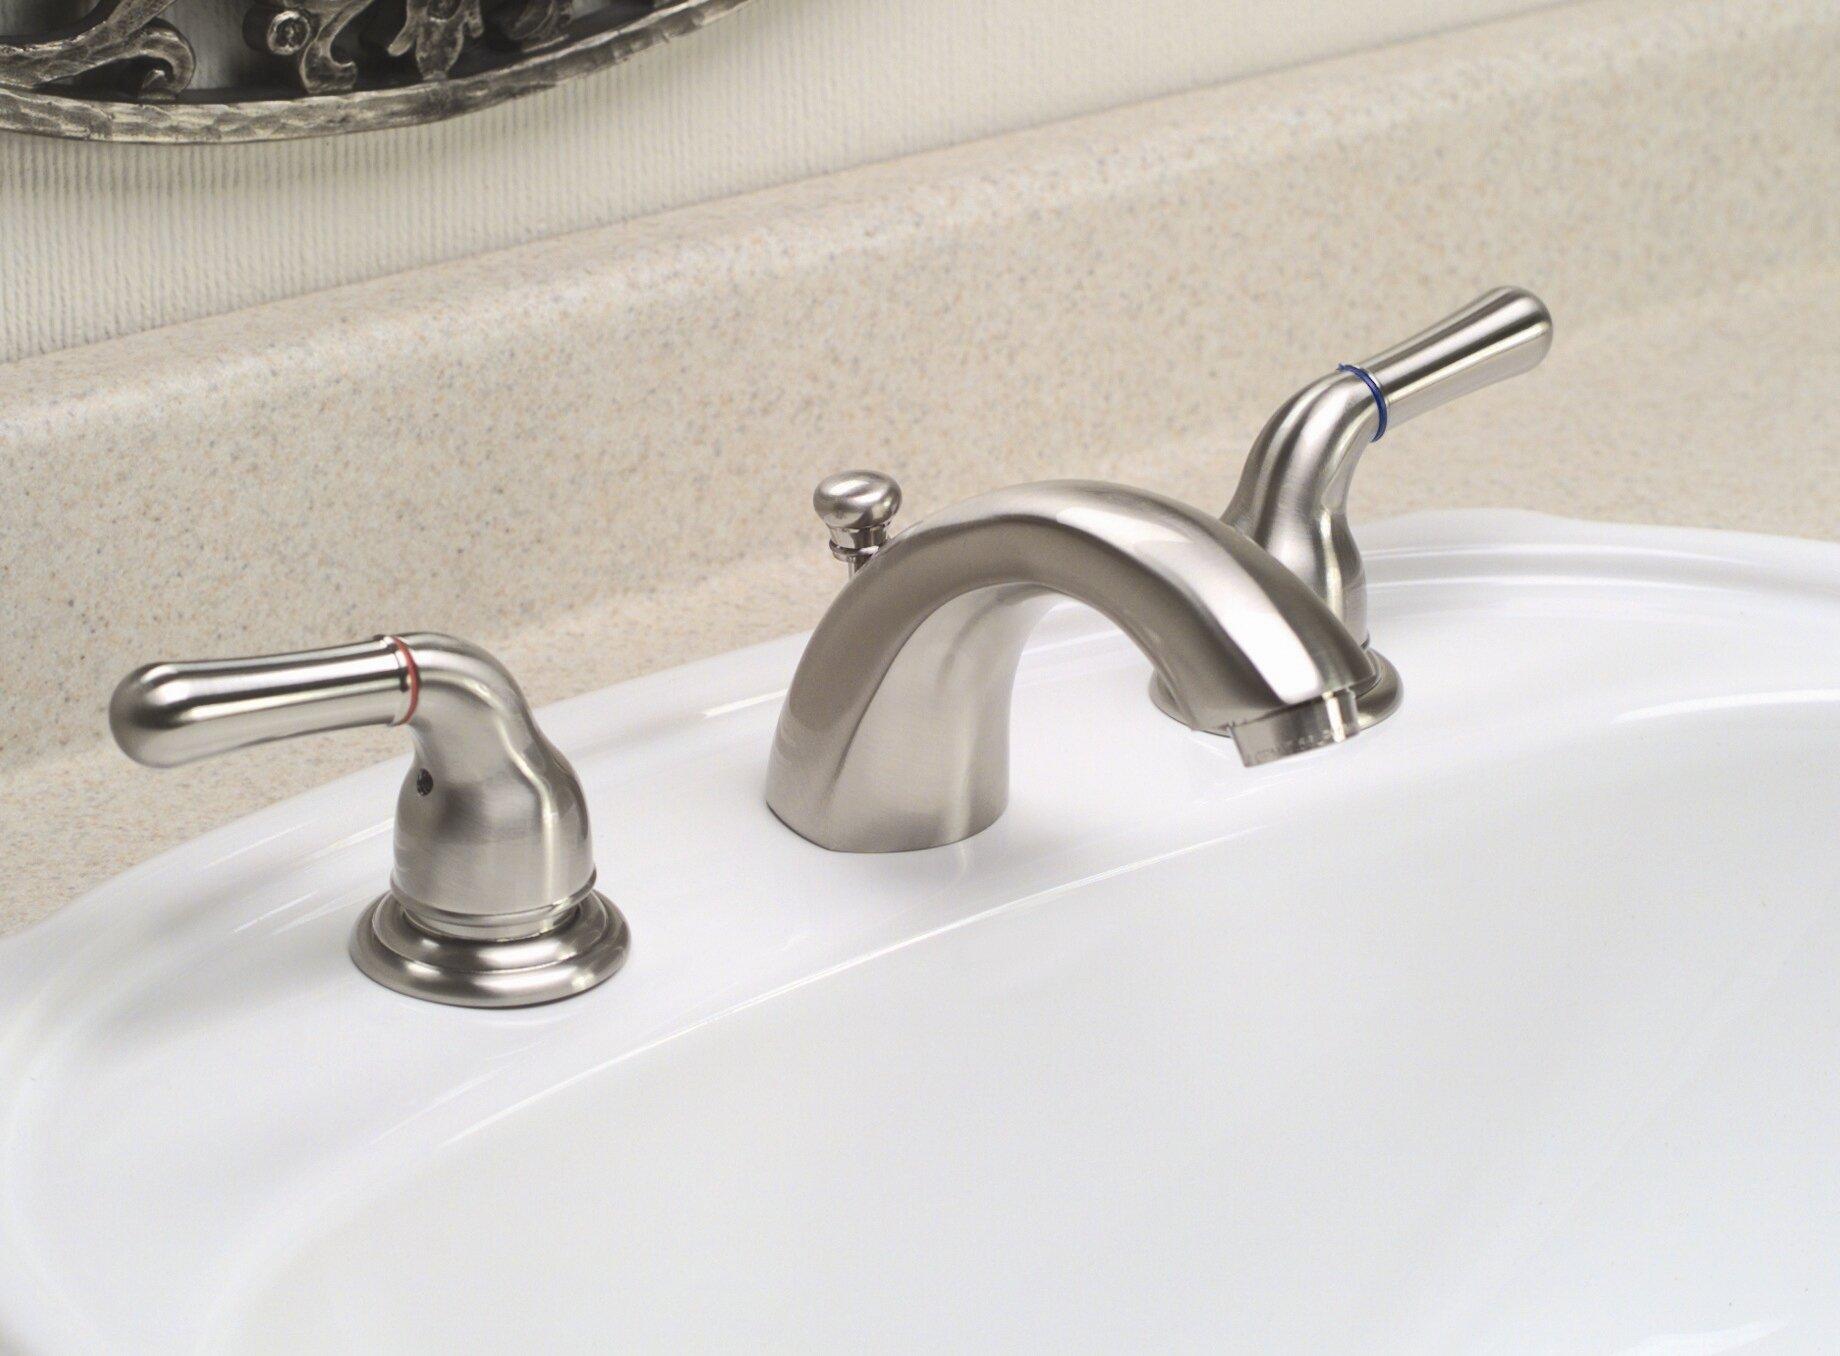 Premier Faucet Sanibel Widespread Bathroom With Cold And Hot Handles Wayfair